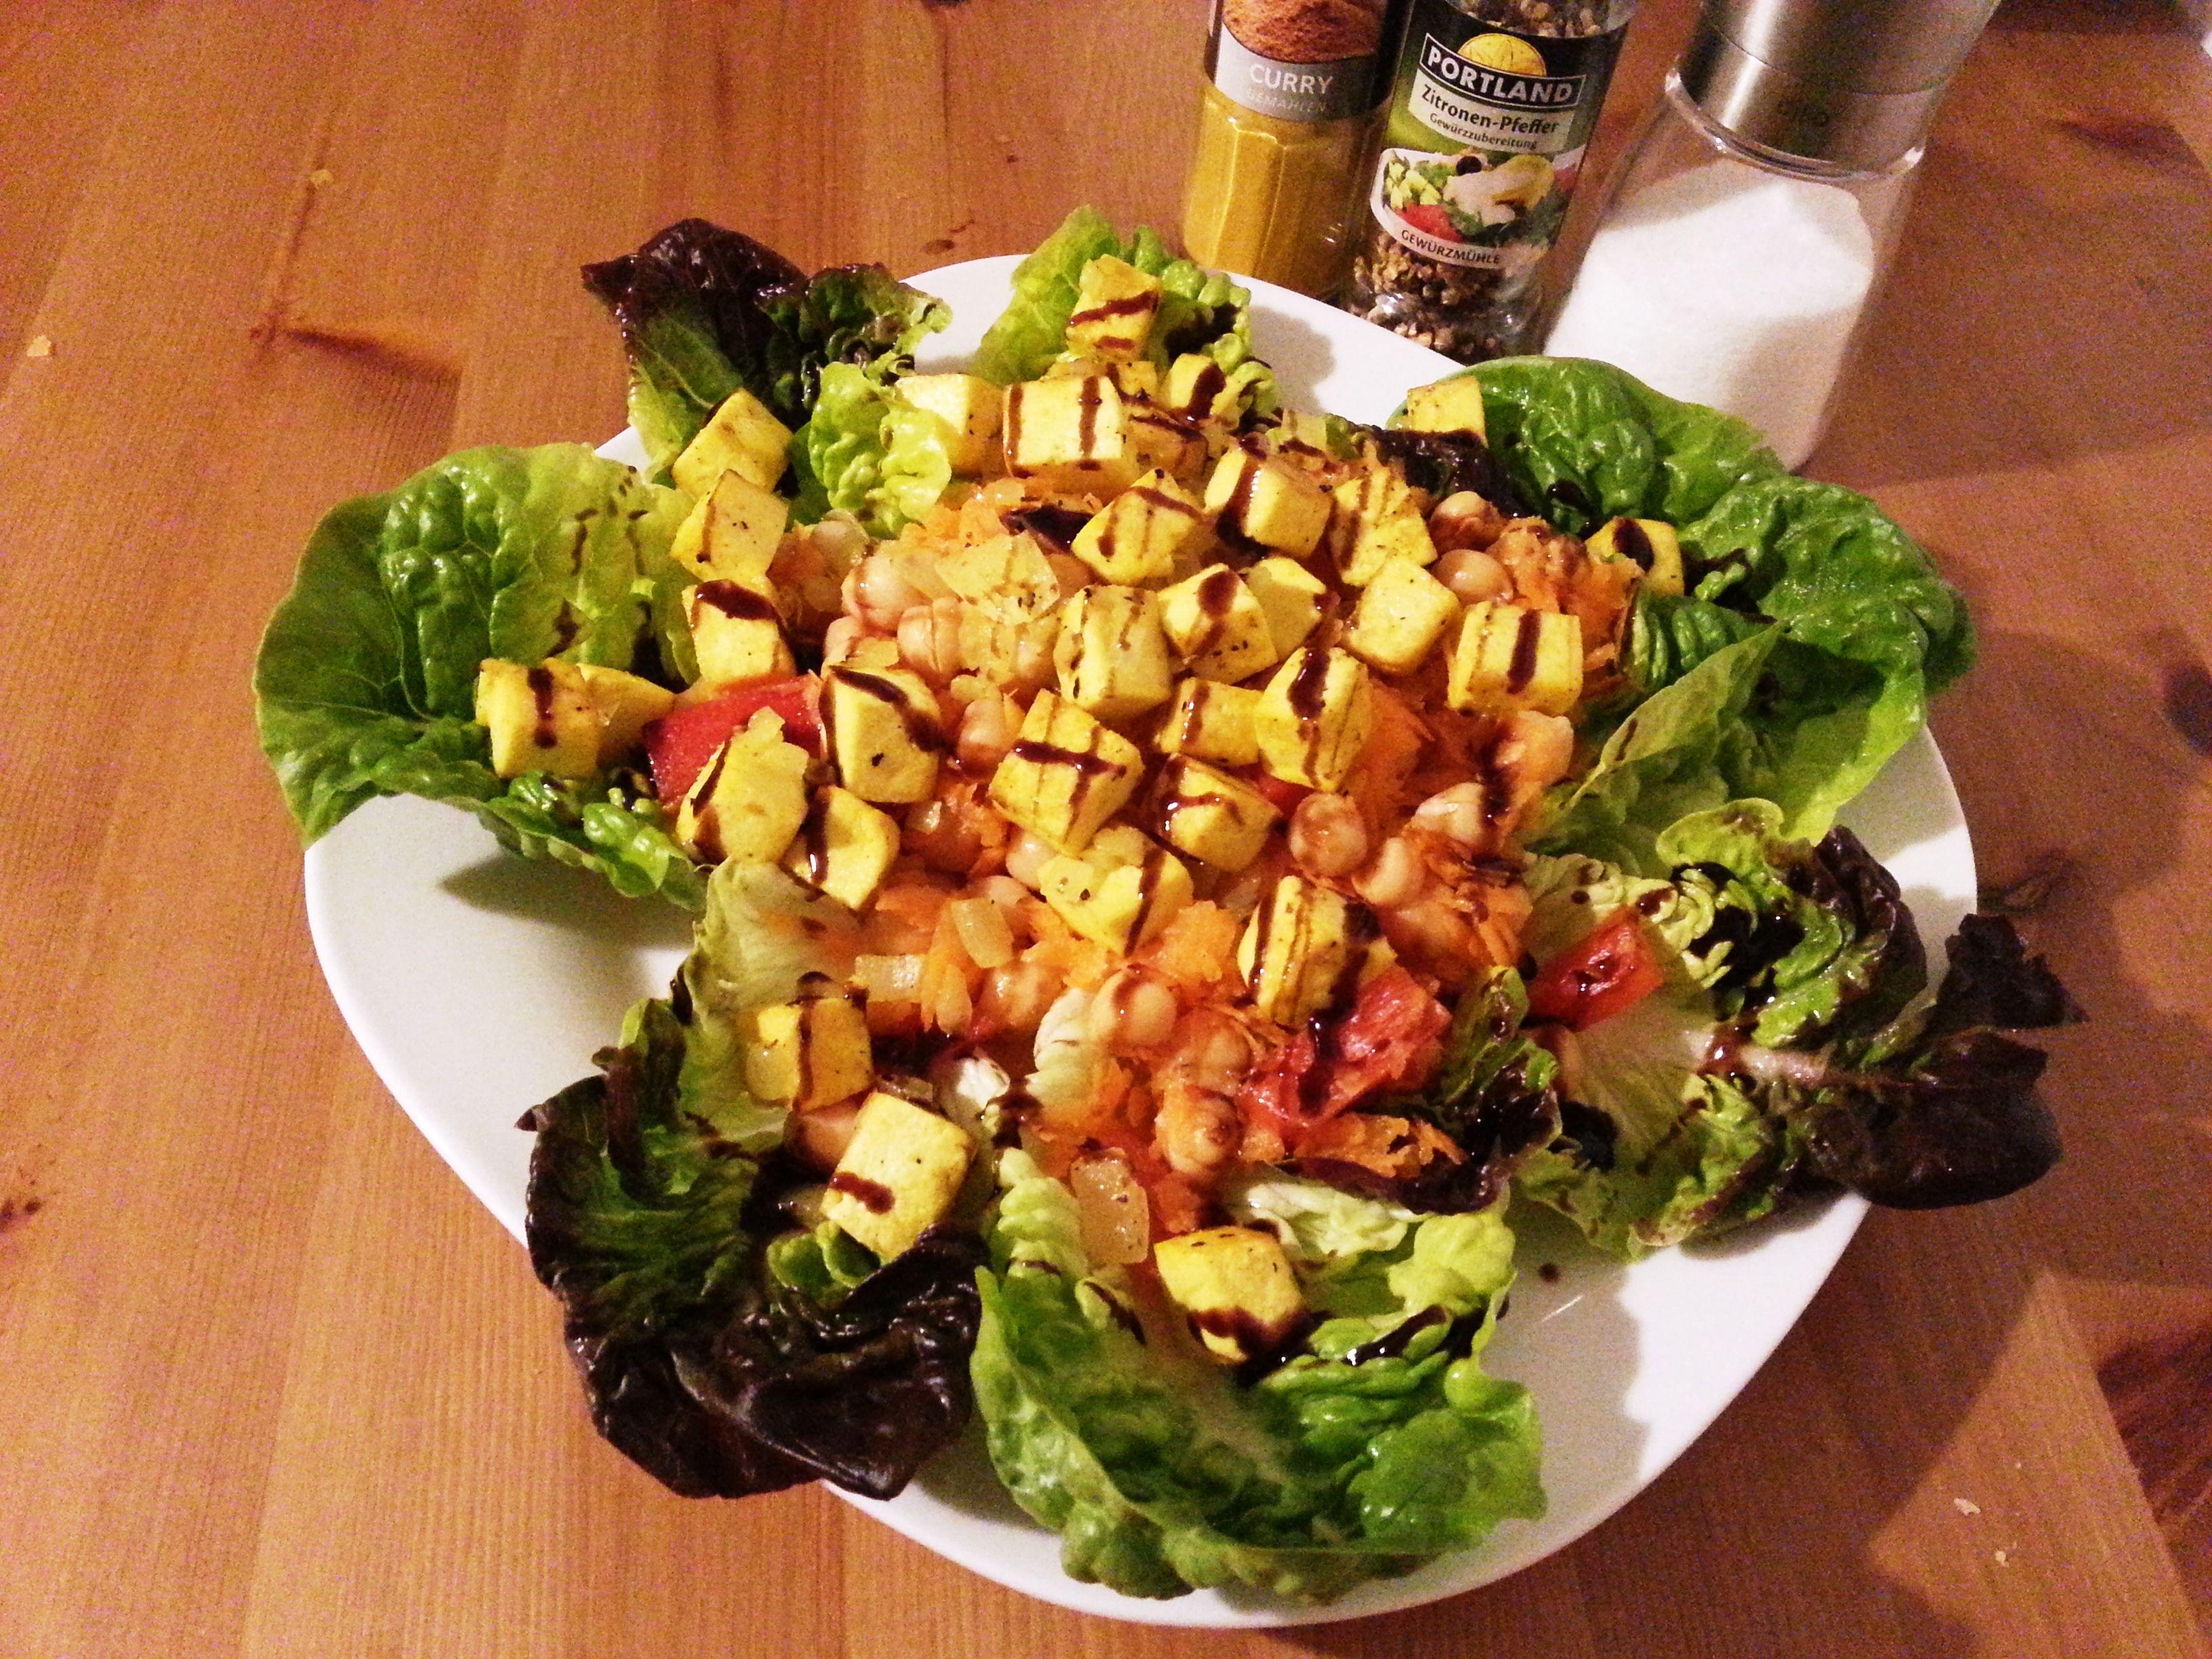 Bezaubernd Tofu Nährwerte Beste Wahl Fitnessrezept Kichererbsen Salat Mit - Nährwerte: Kalorien